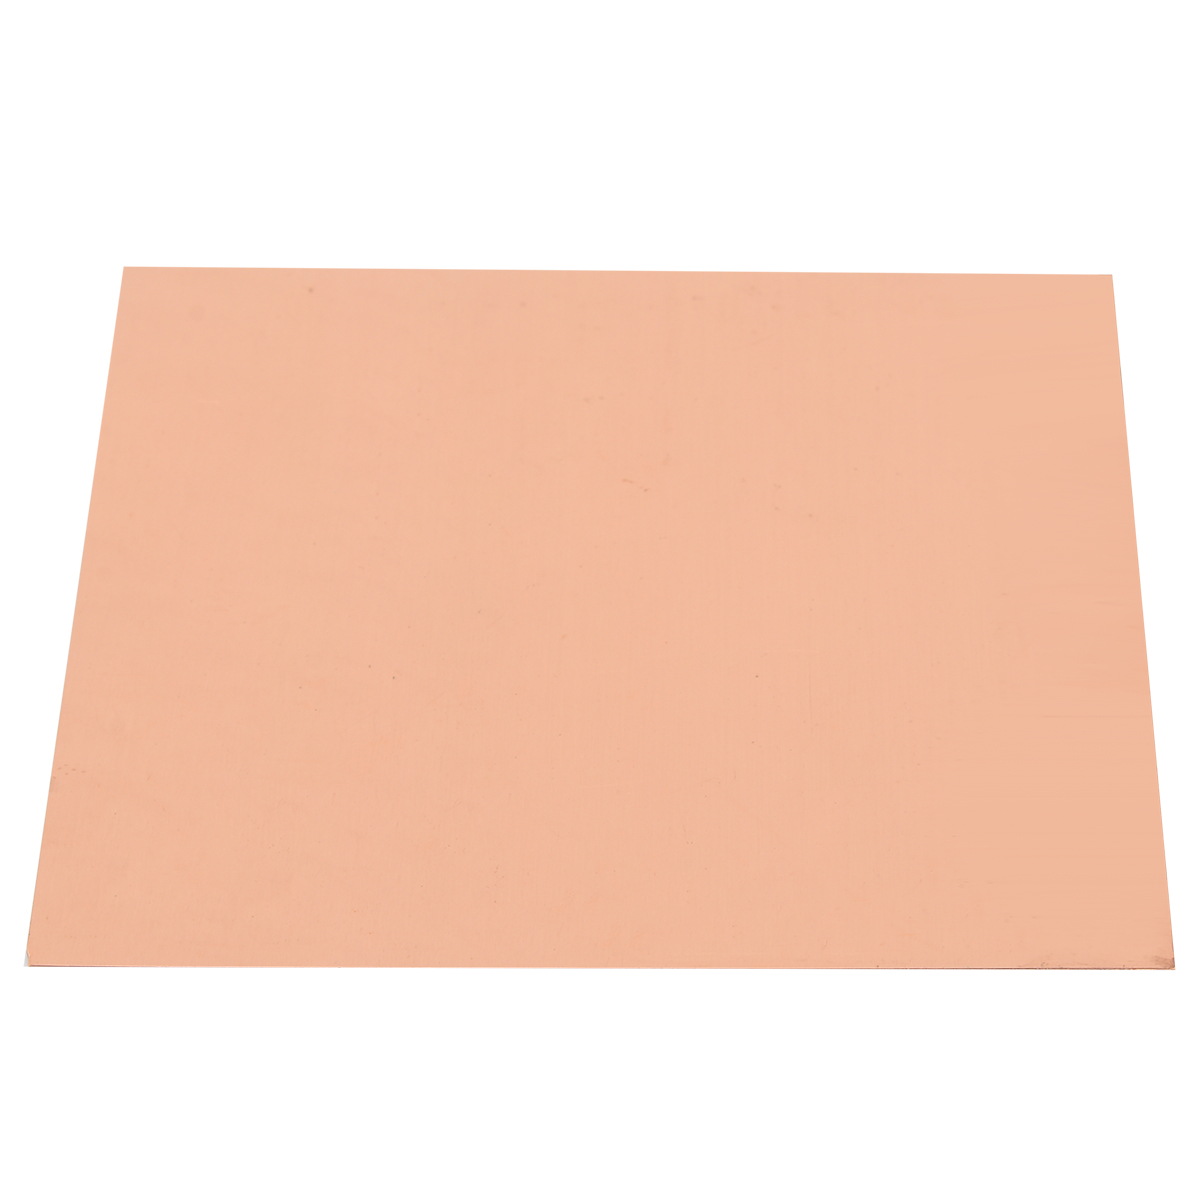 "24 gauge Copper Sheet Bright Polished 10/""x10/"" Copper Sheet 16oz"